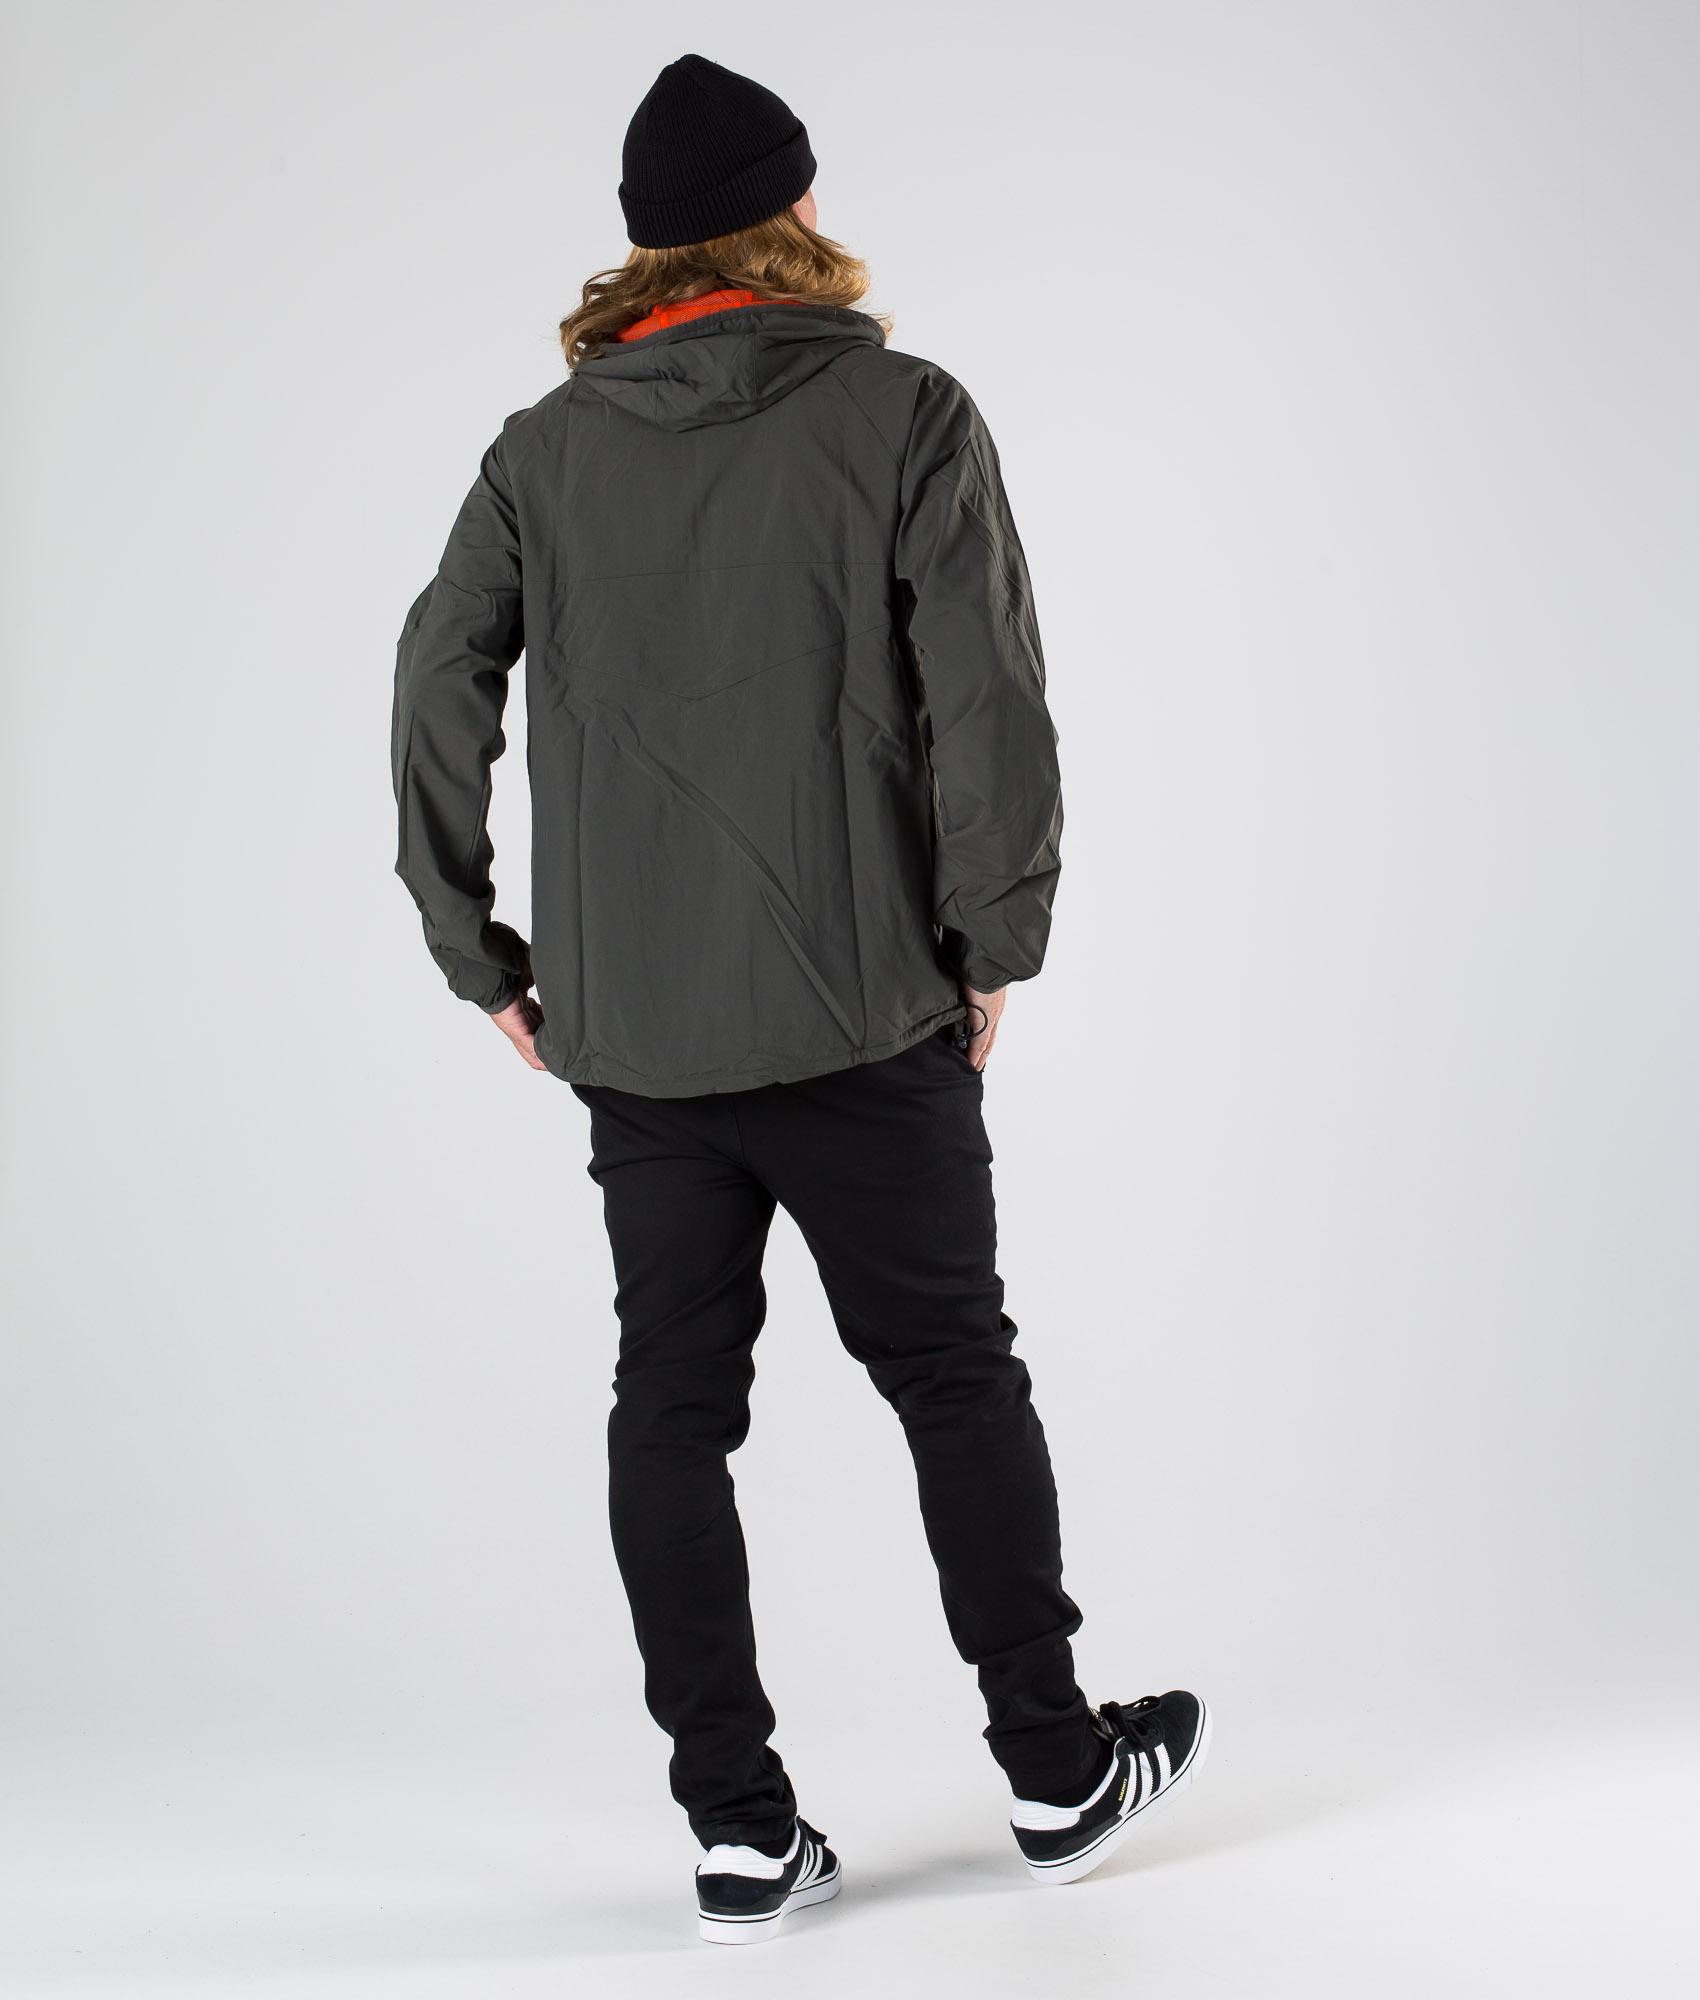 Adidas Skateboarding Dekum Packable Wind Jacke Legend EarthActive Orange